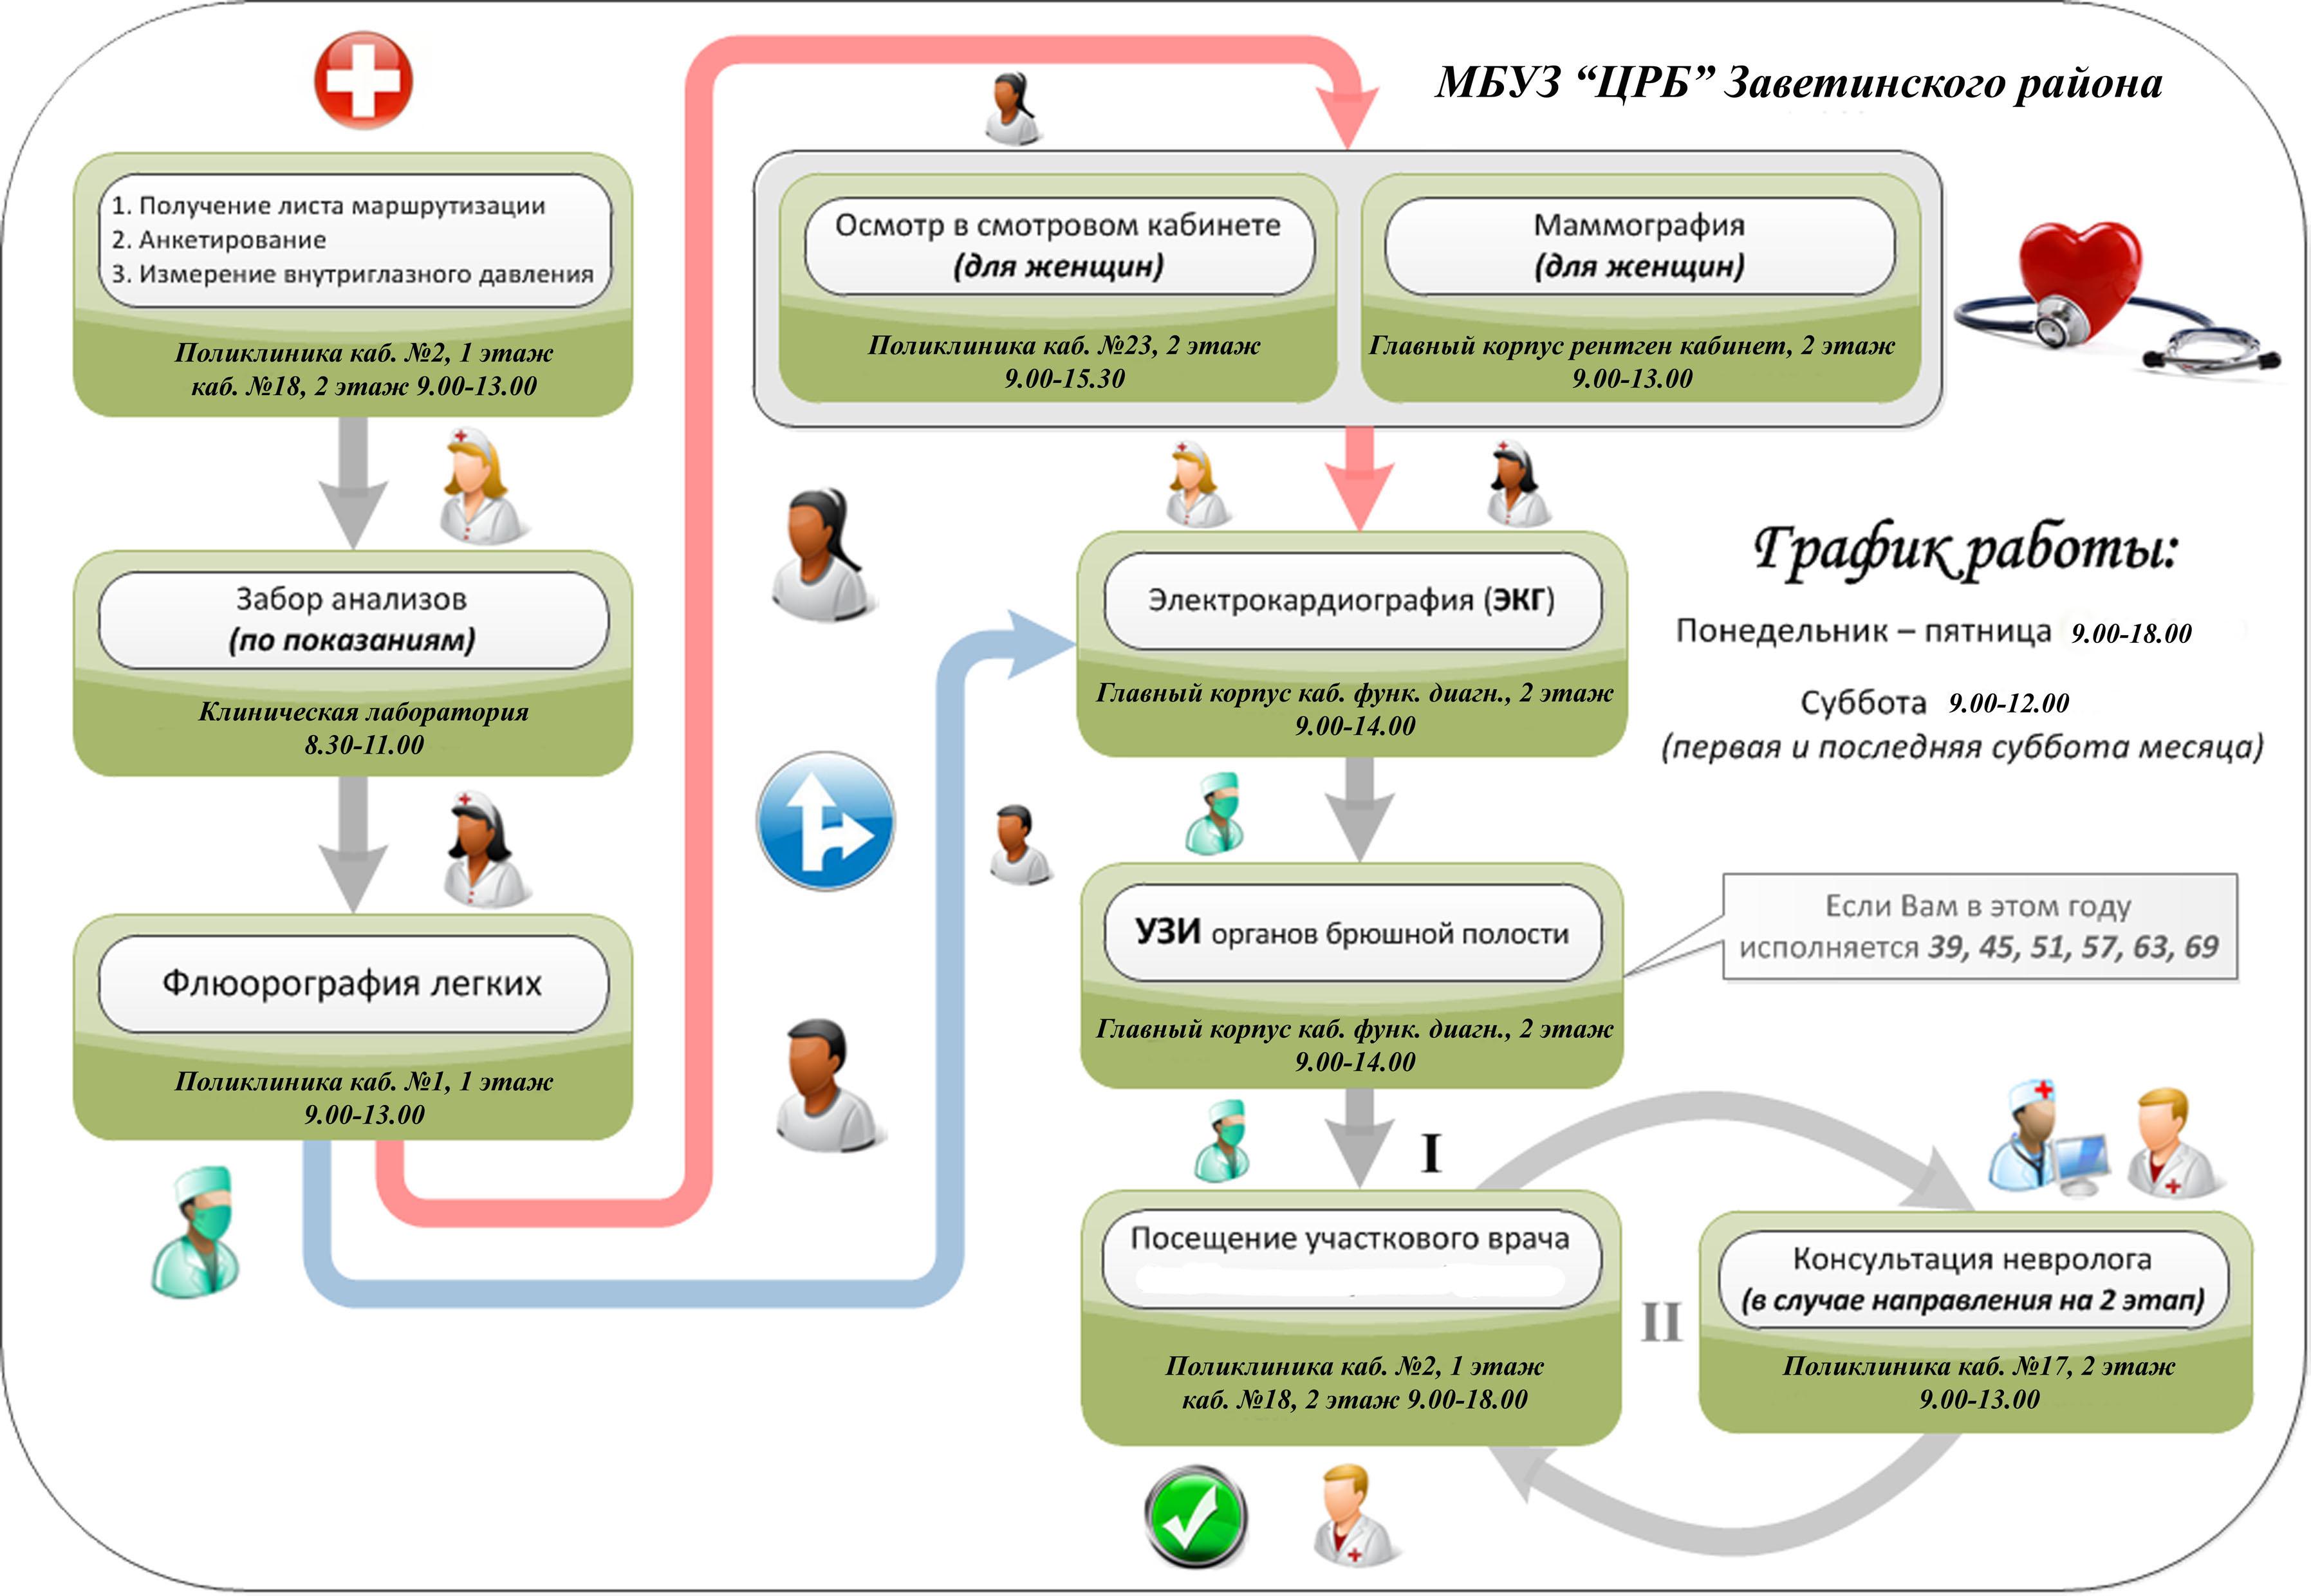 Схема движения пациента в клинике